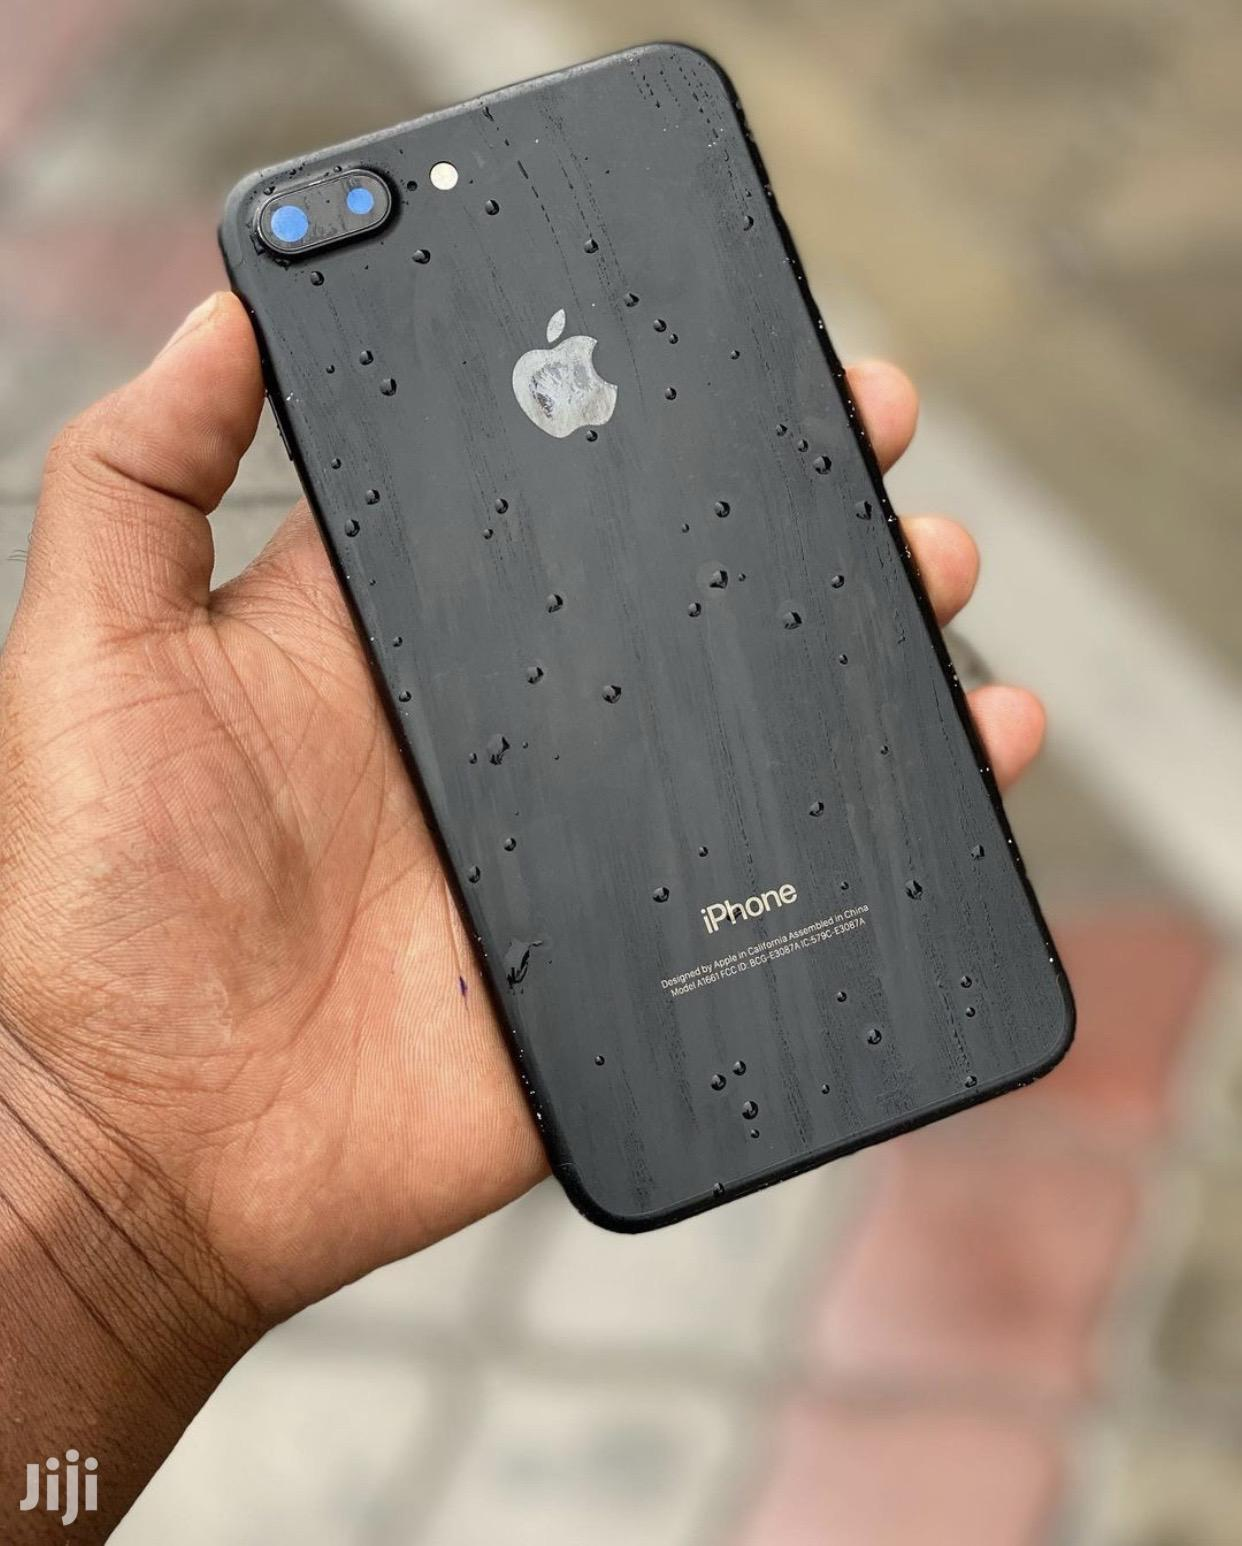 Apple iPhone 7 Plus 128 GB Black | Mobile Phones for sale in Kinondoni, Dar es Salaam, Tanzania